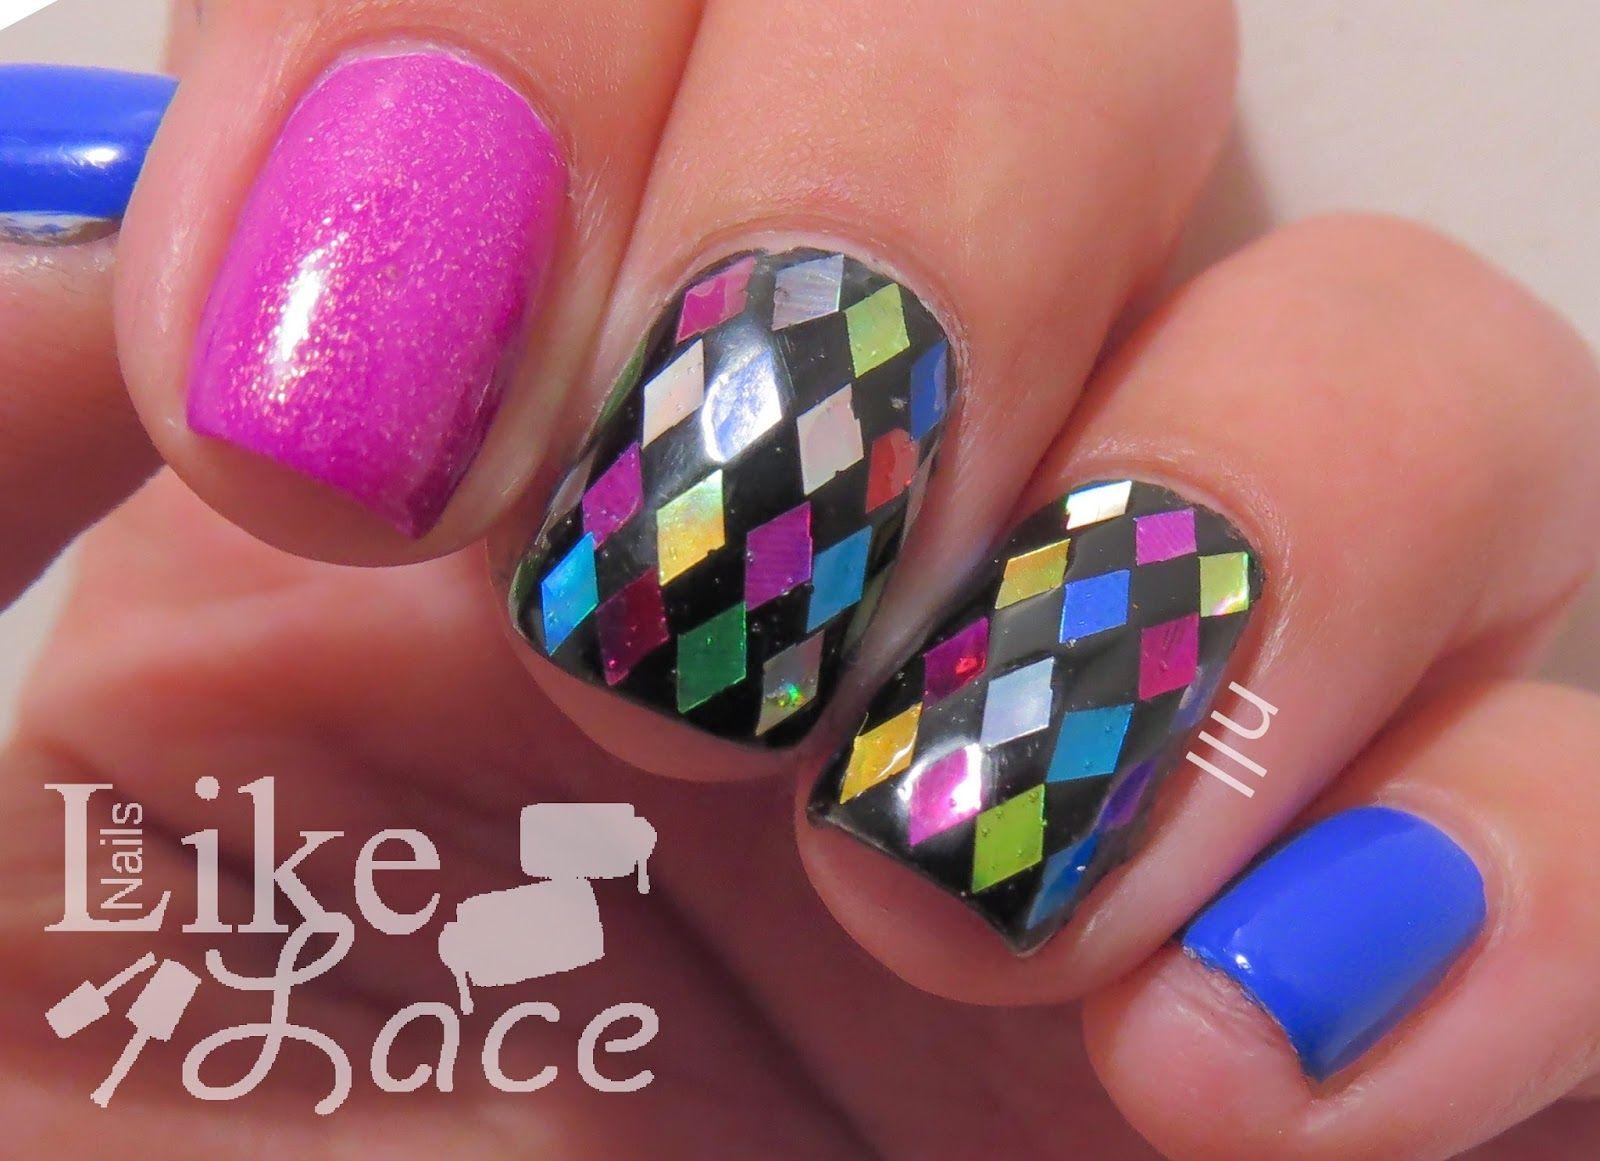 NailsLikeLace #prom nail art